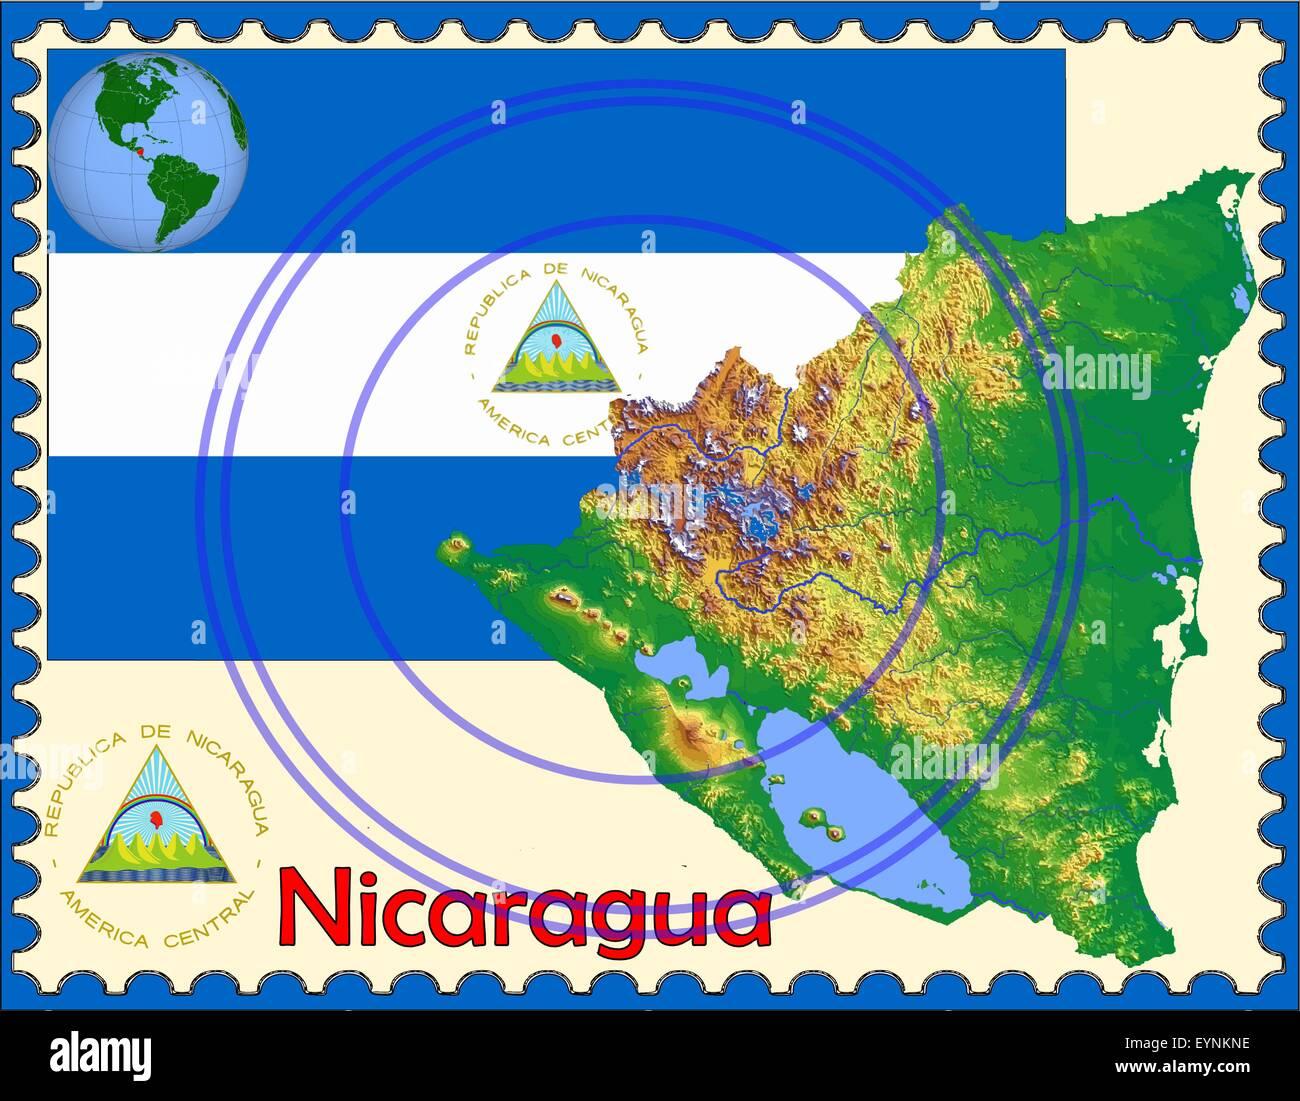 Nicaragua map flag coat stamp - Stock Image